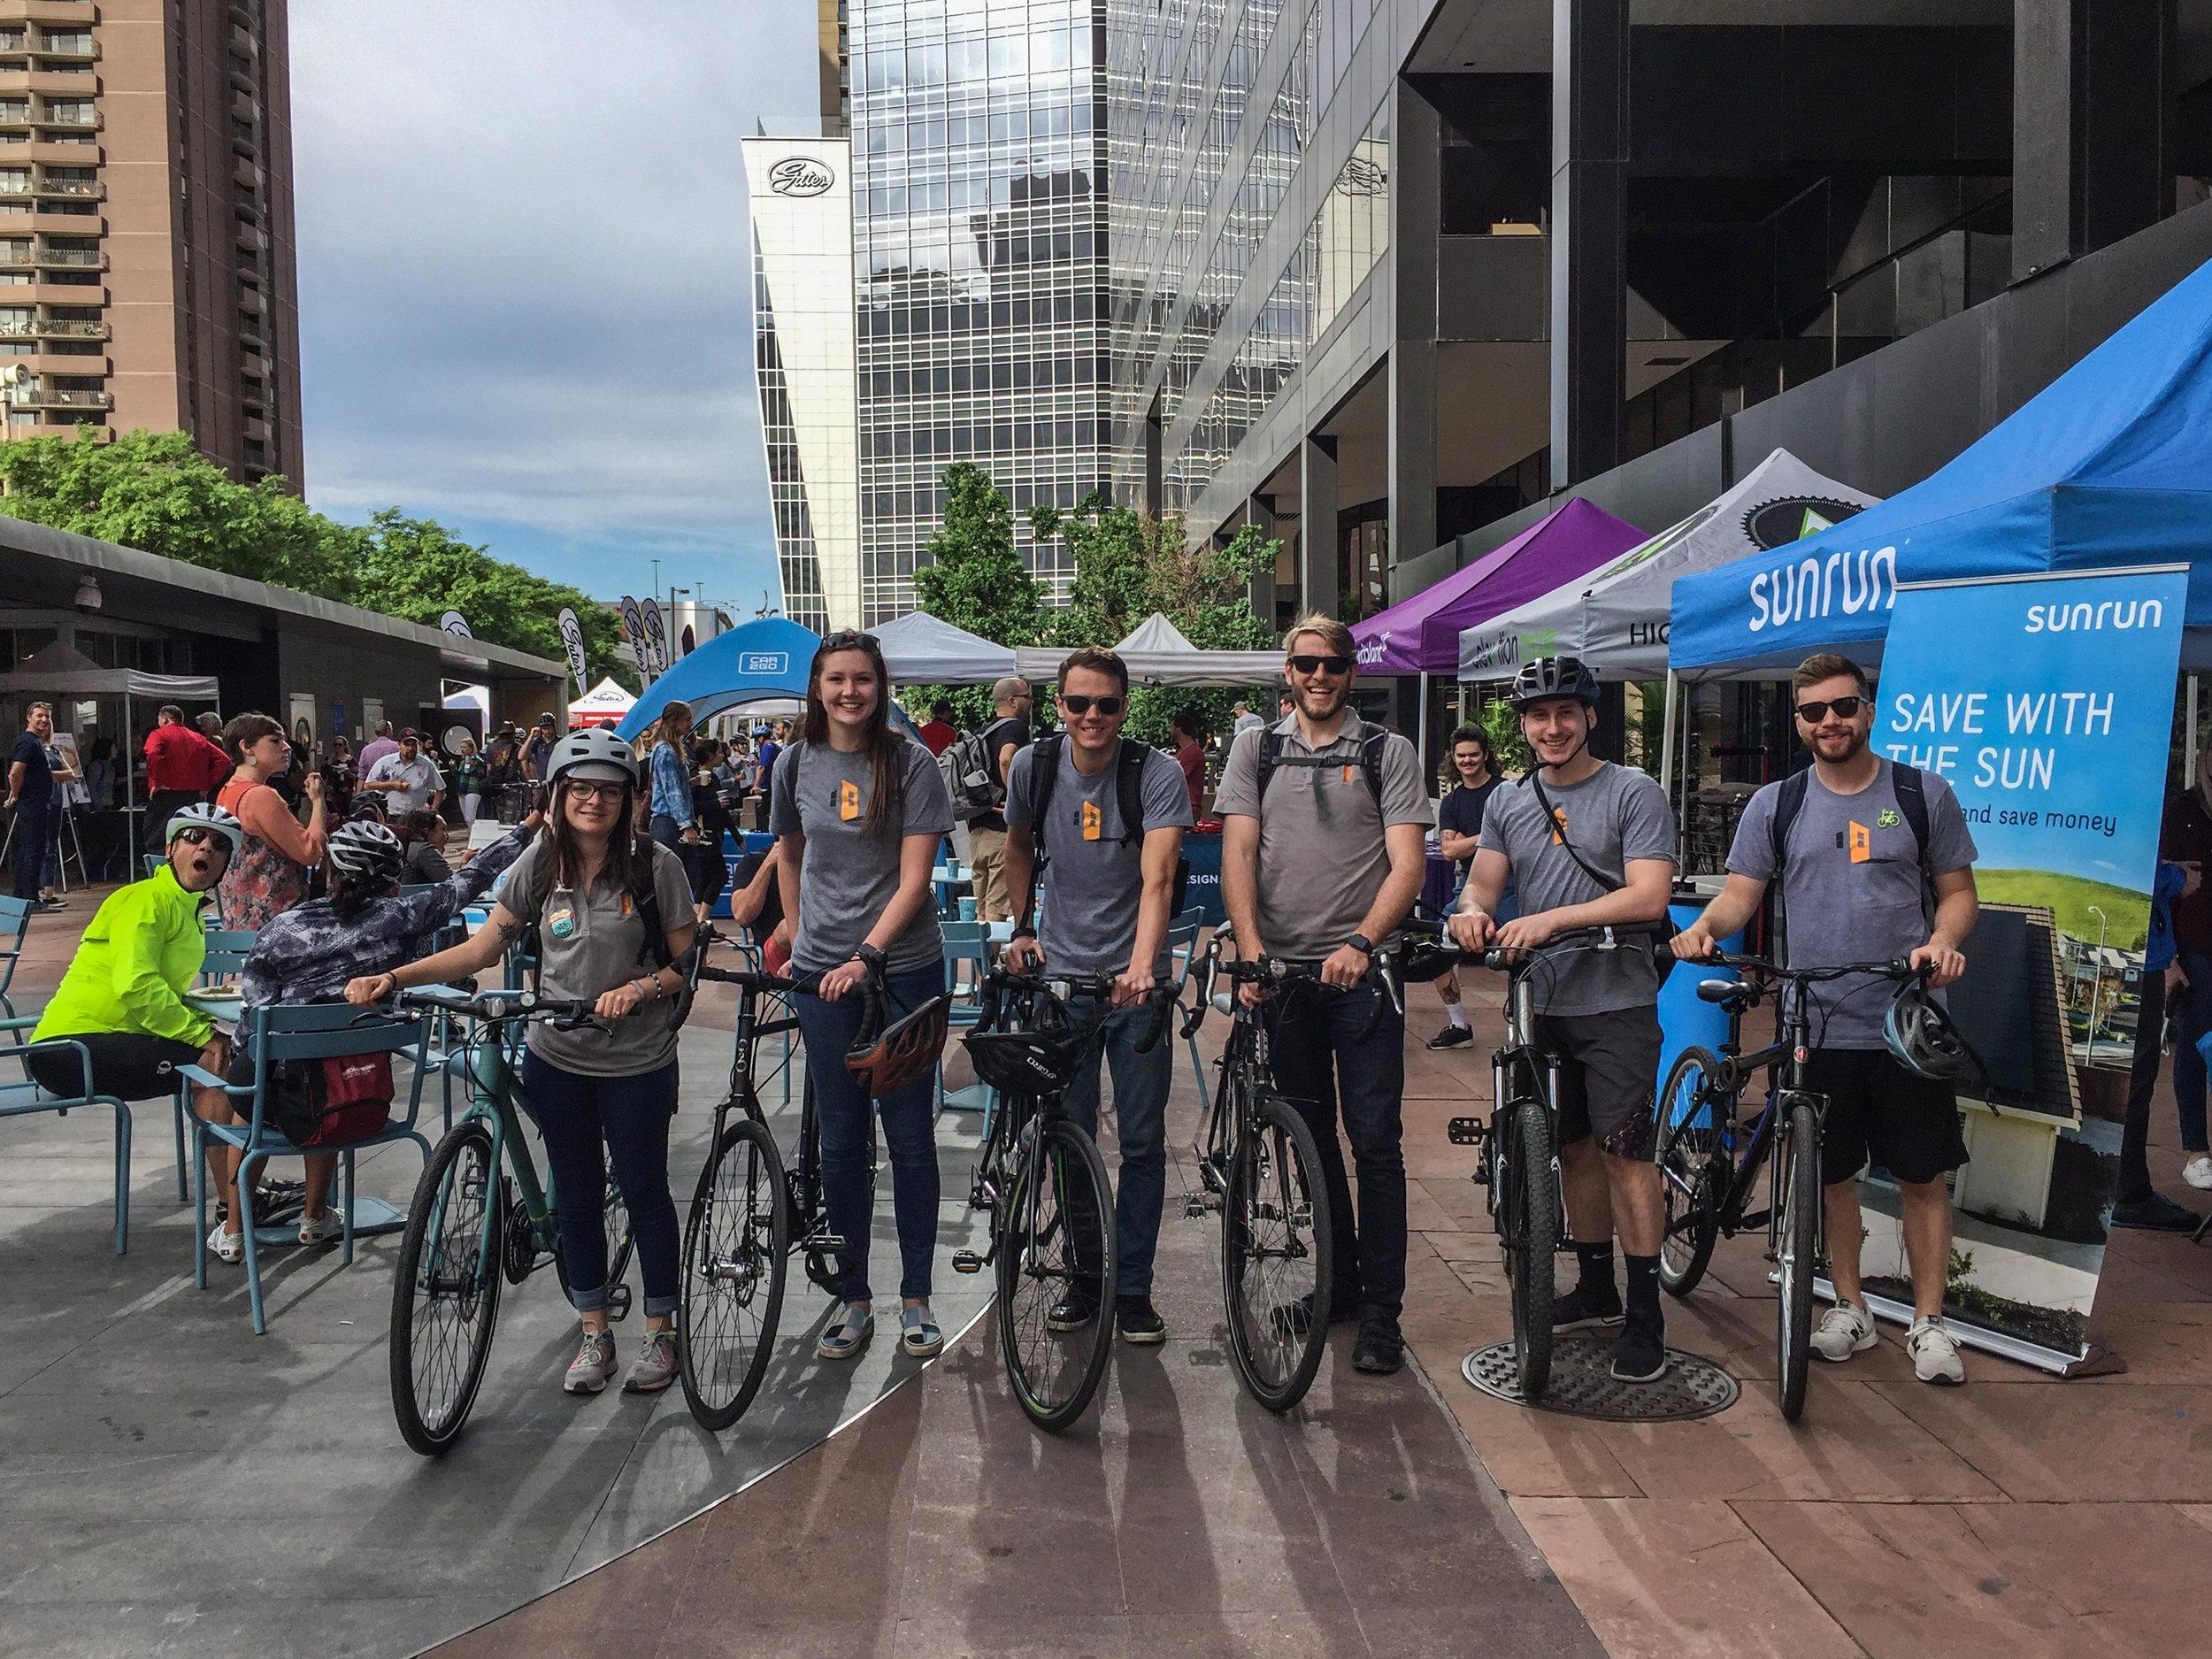 2019 06 26 - Bike to Work Day -  (5).jpg